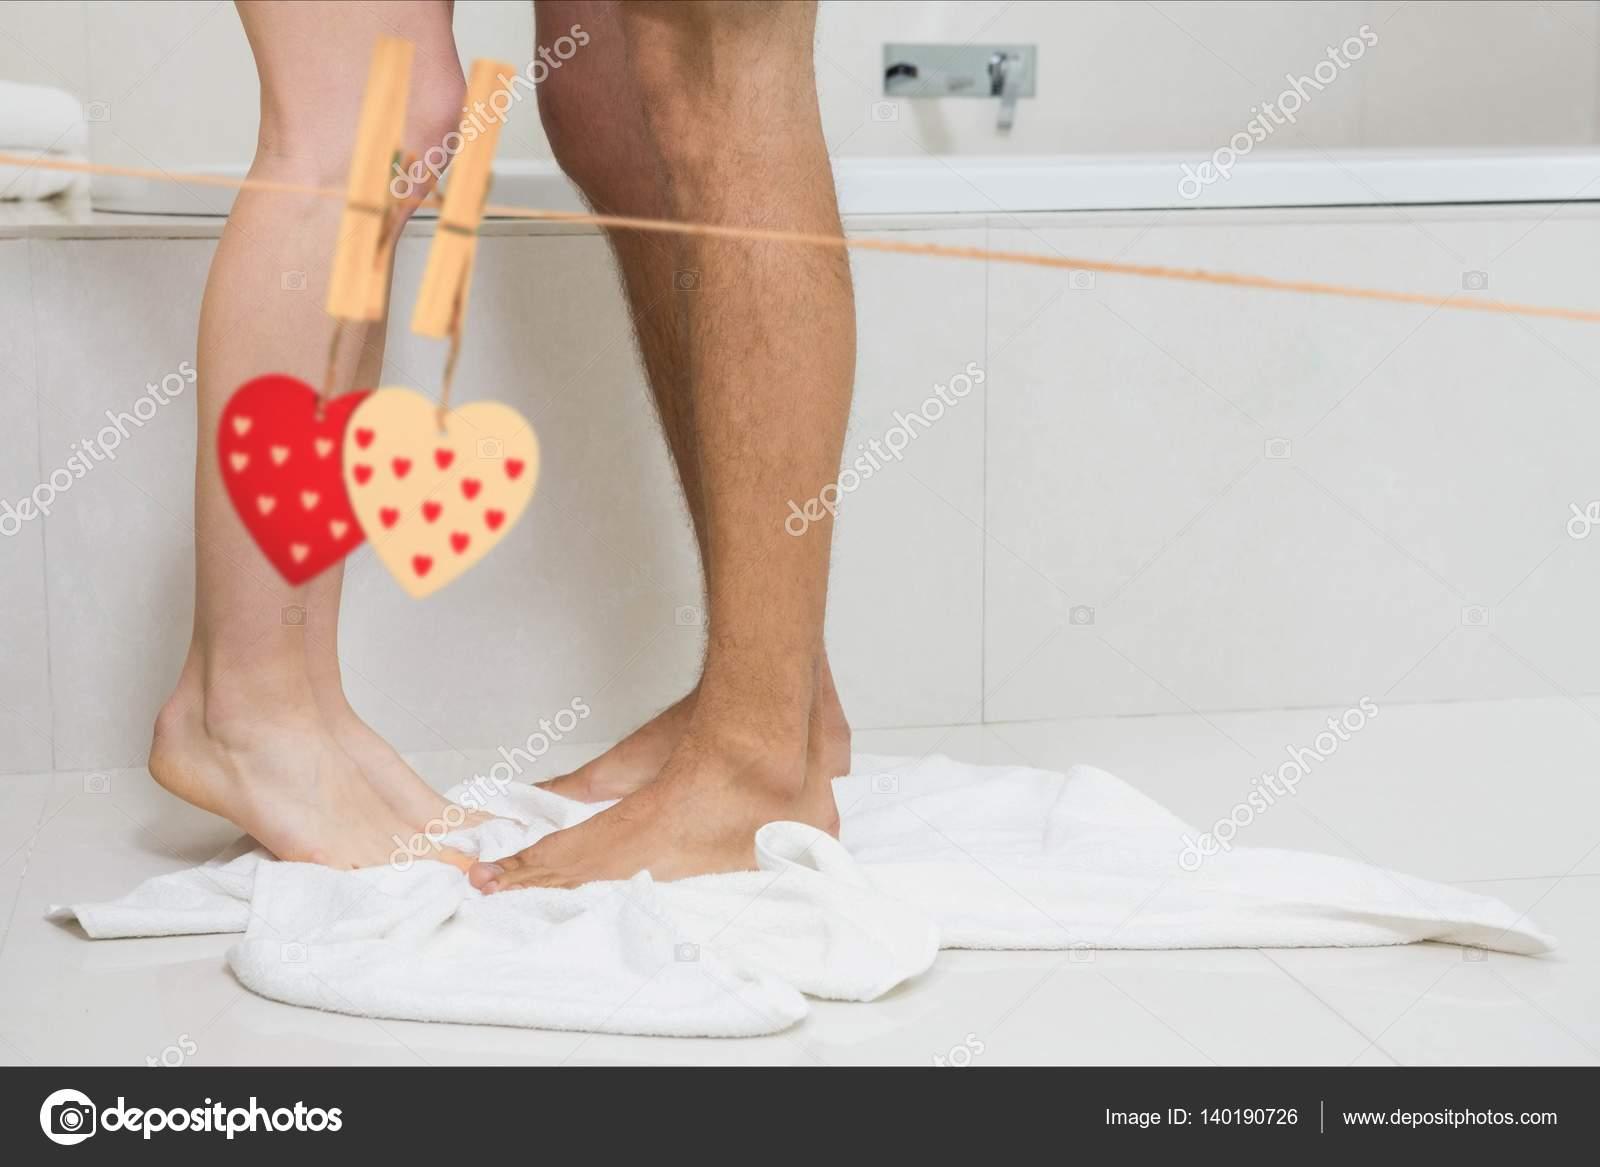 фото ног в ванной комнате